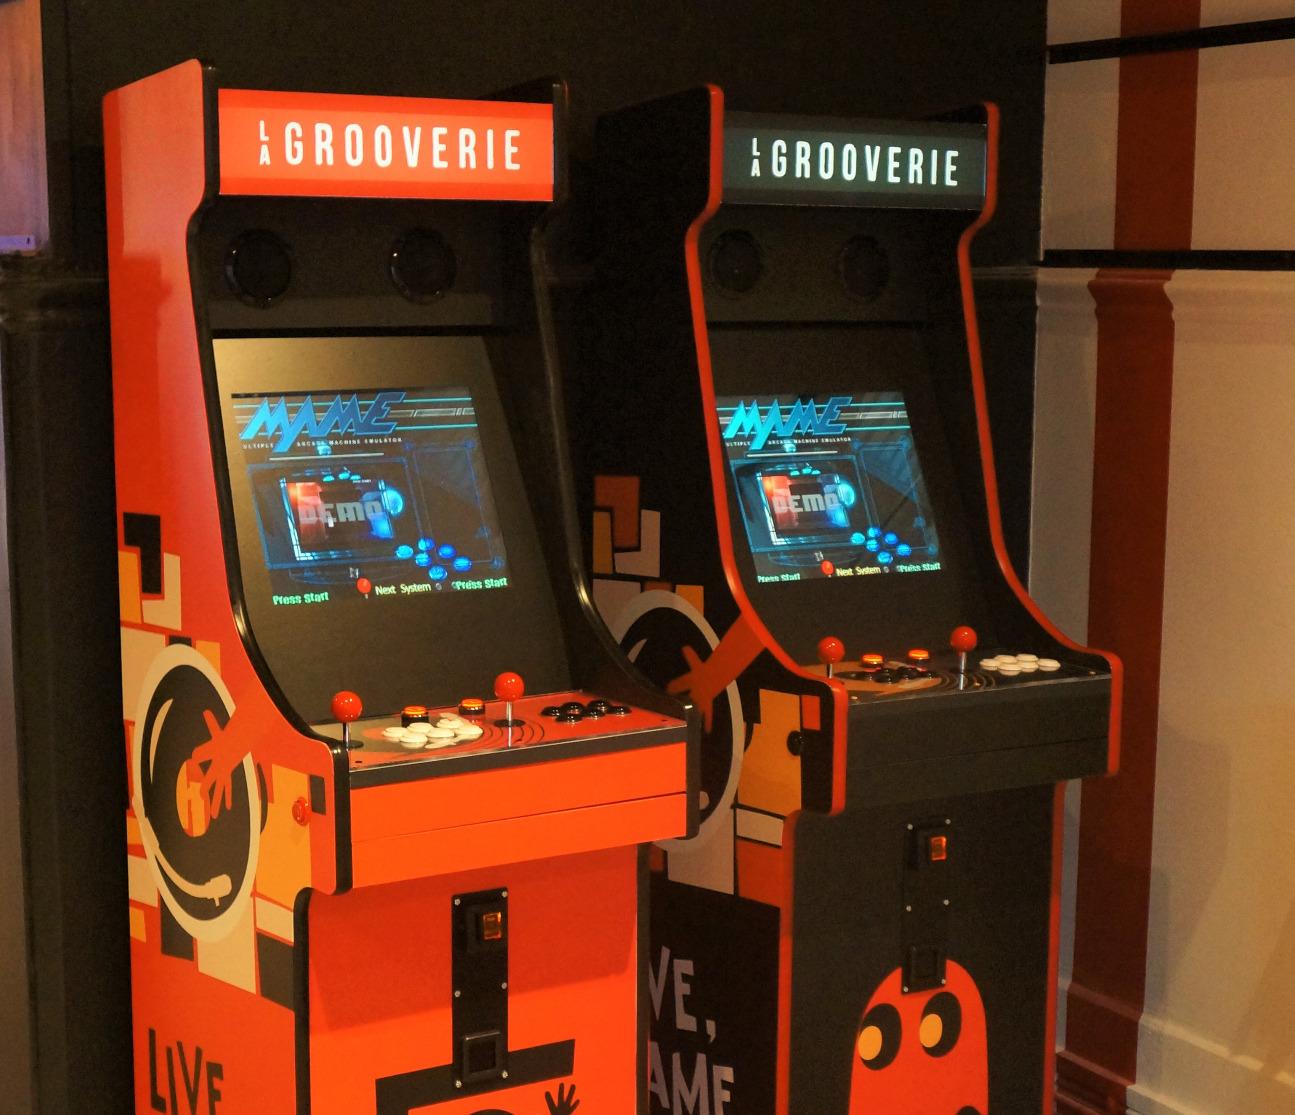 Borne arcade La Grooverie